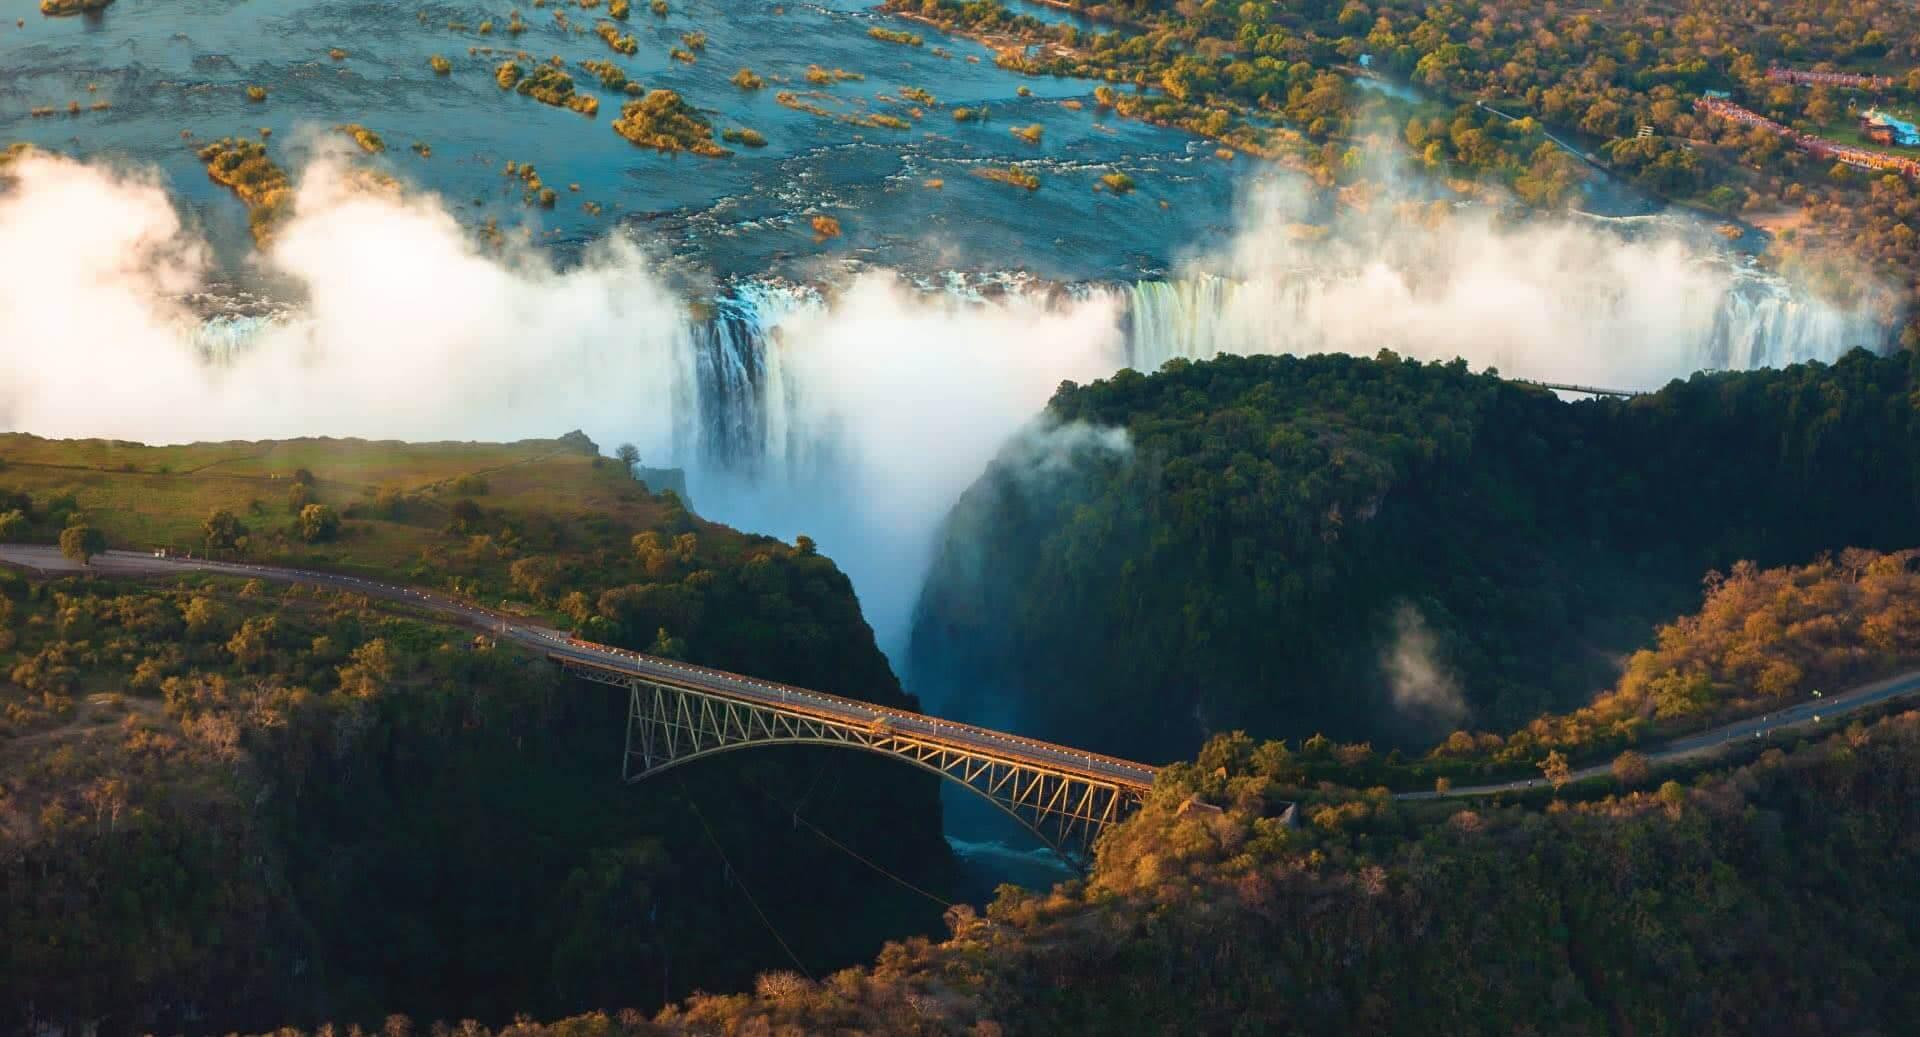 zambia africa viajar emiratos